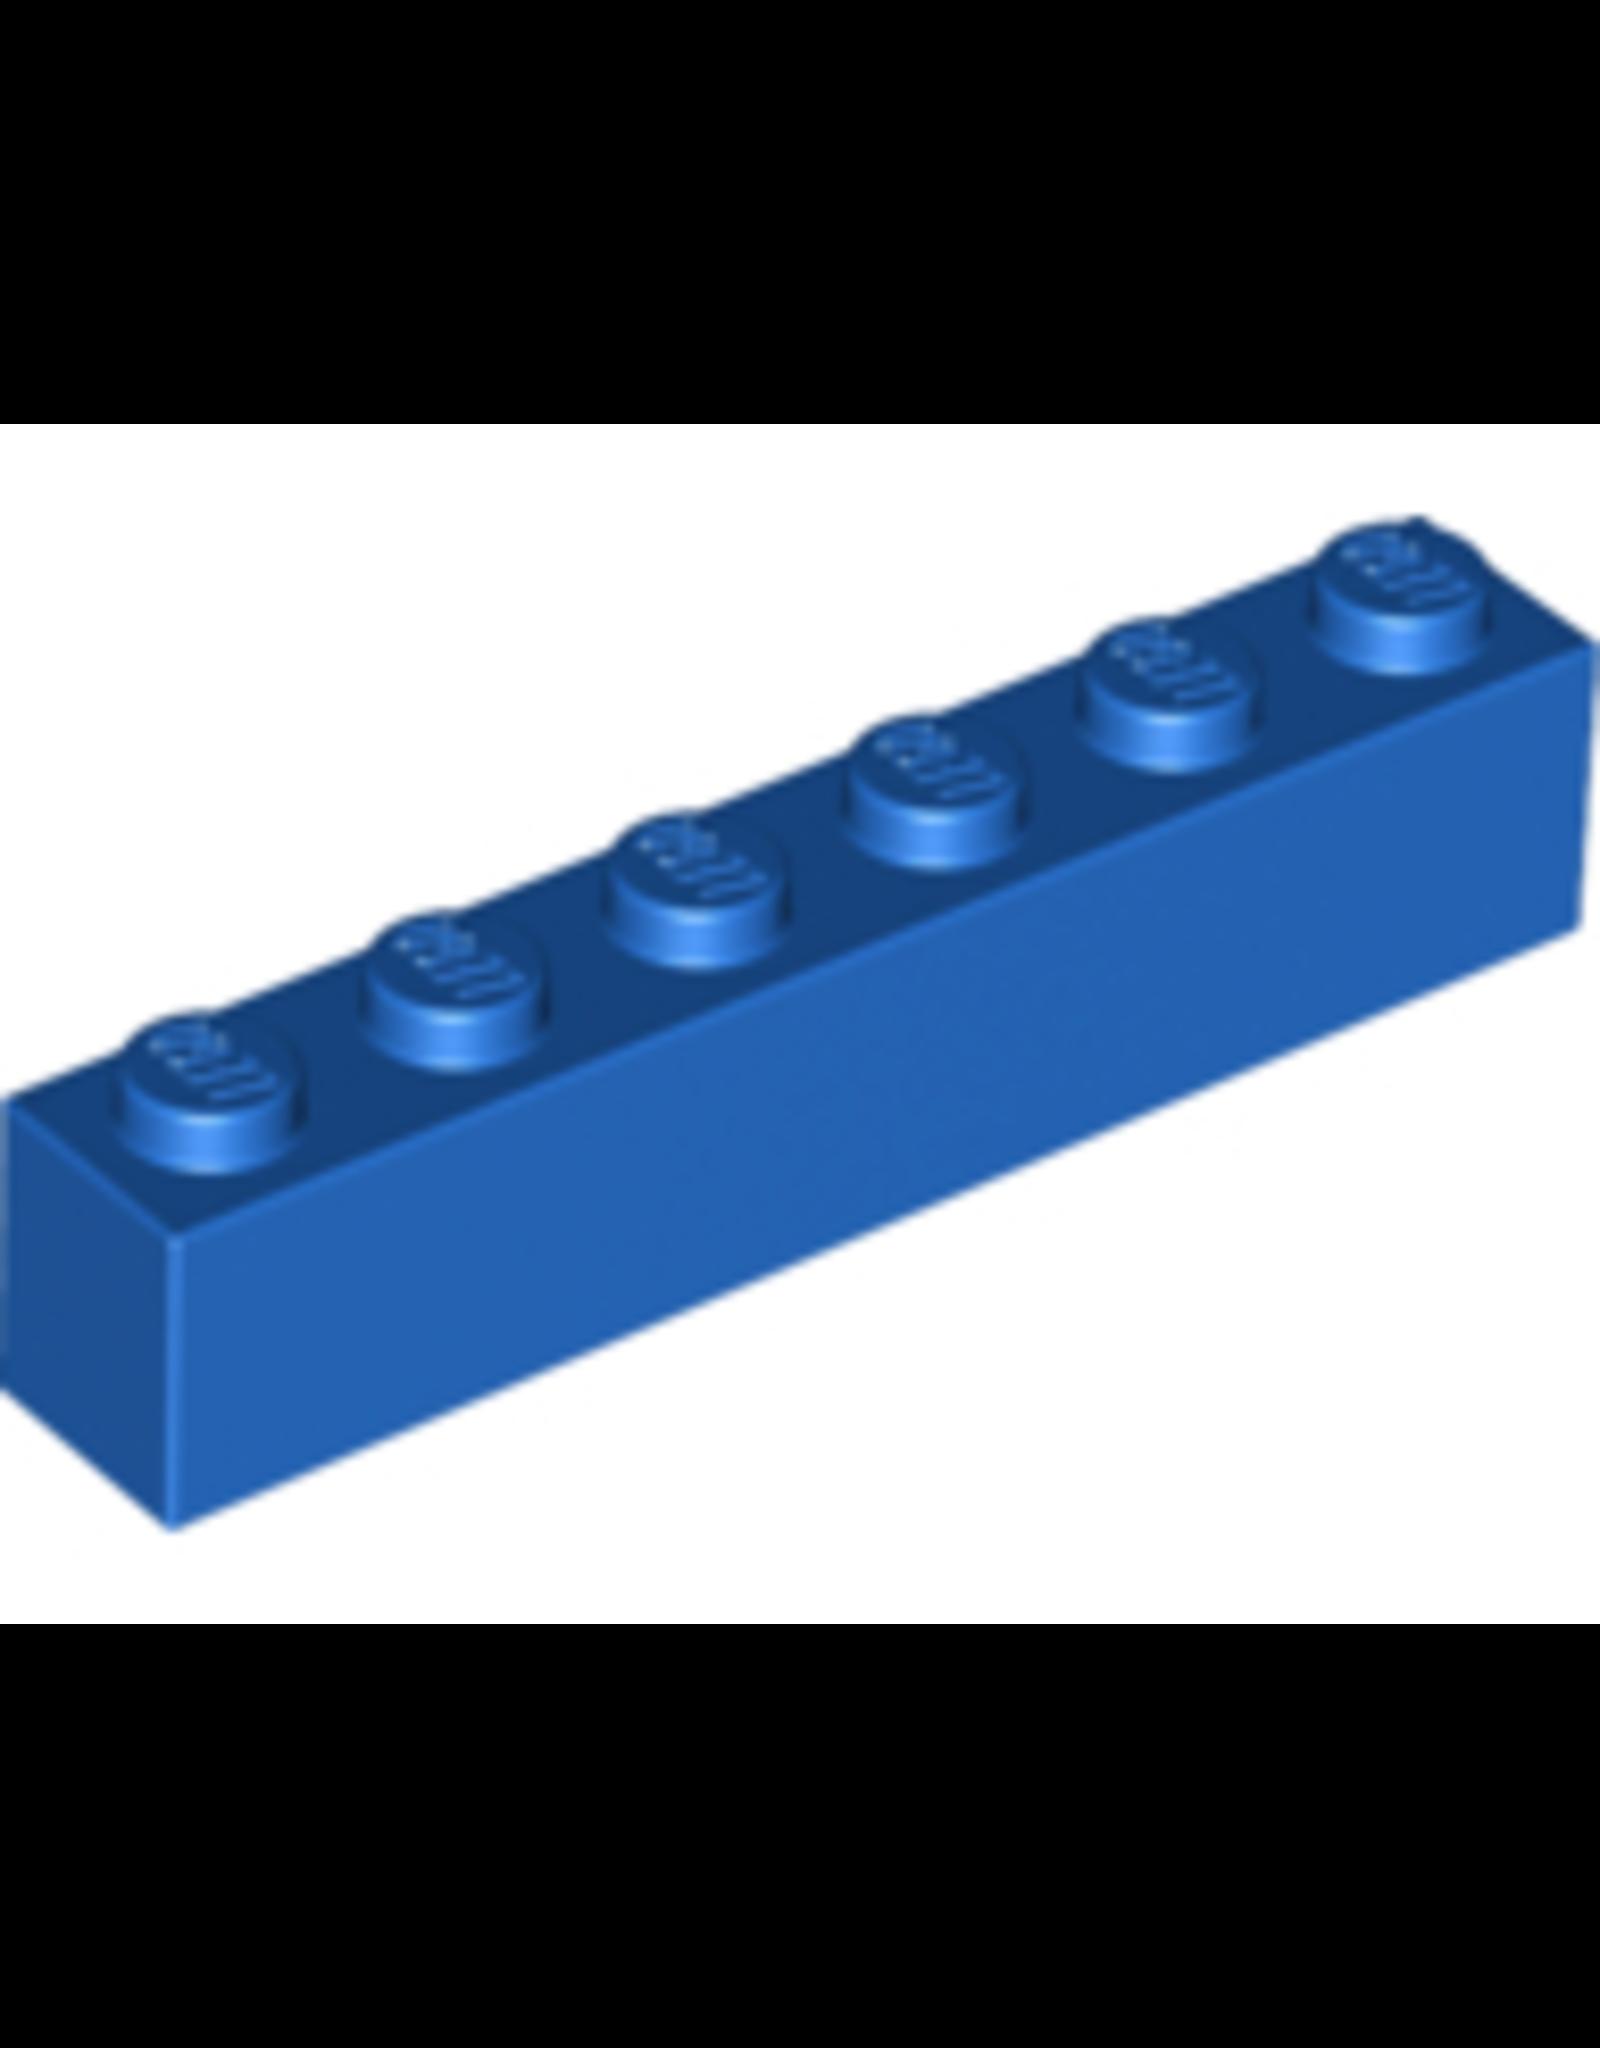 LEGO LEGO 3009 Steen 1x6 Blauw (100 stuks)